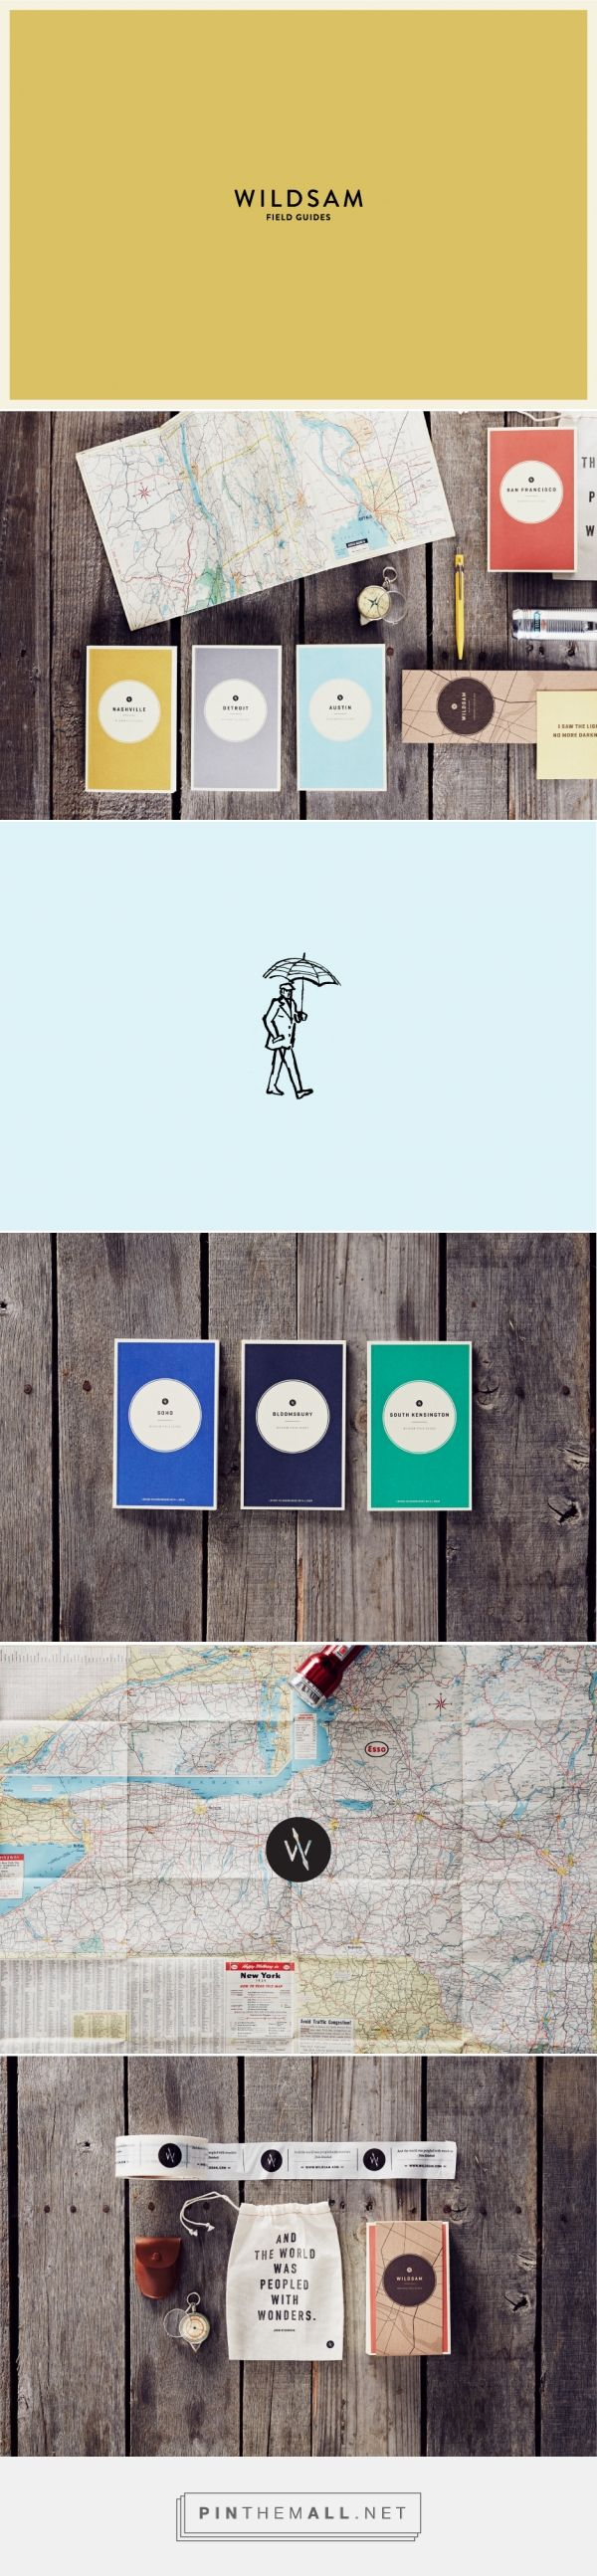 Wildsam Field Guide Branding by Stitch Design Co.   Fivestar Branding – Design and Branding Agency & Inspiration Gallery